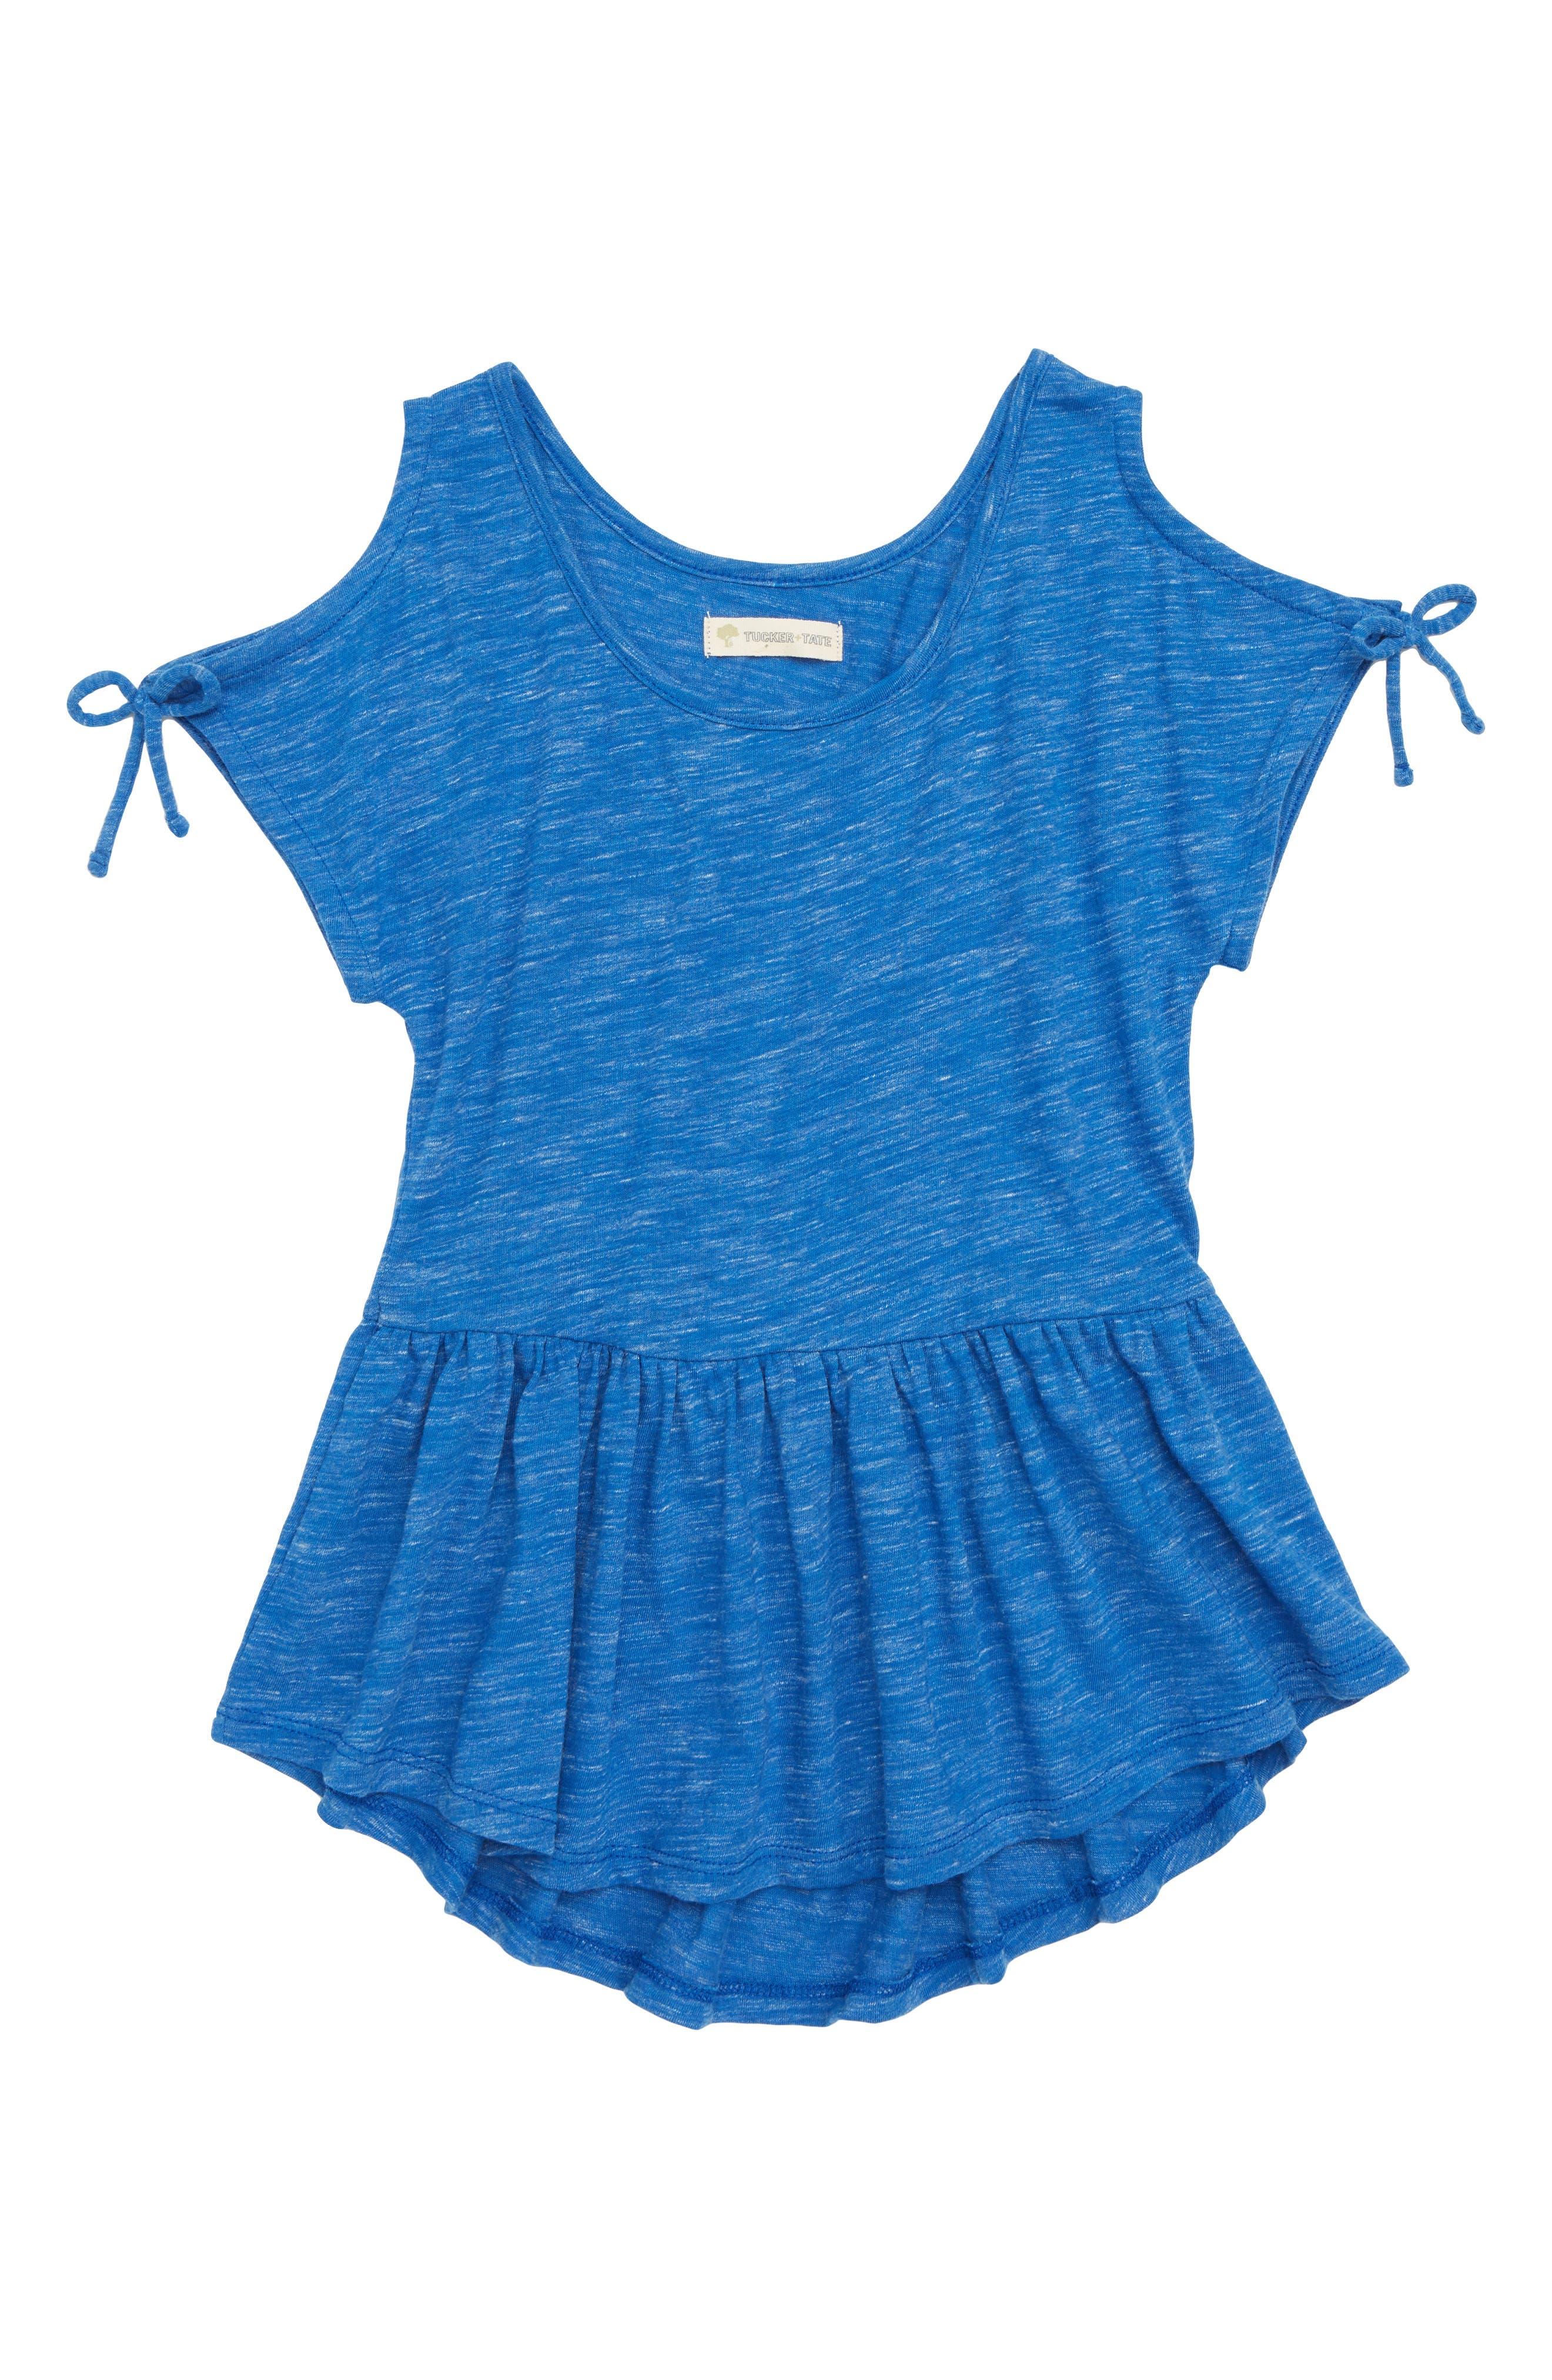 Tie Sleeve Peplum Tee,                         Main,                         color, Blue Monaco Heather